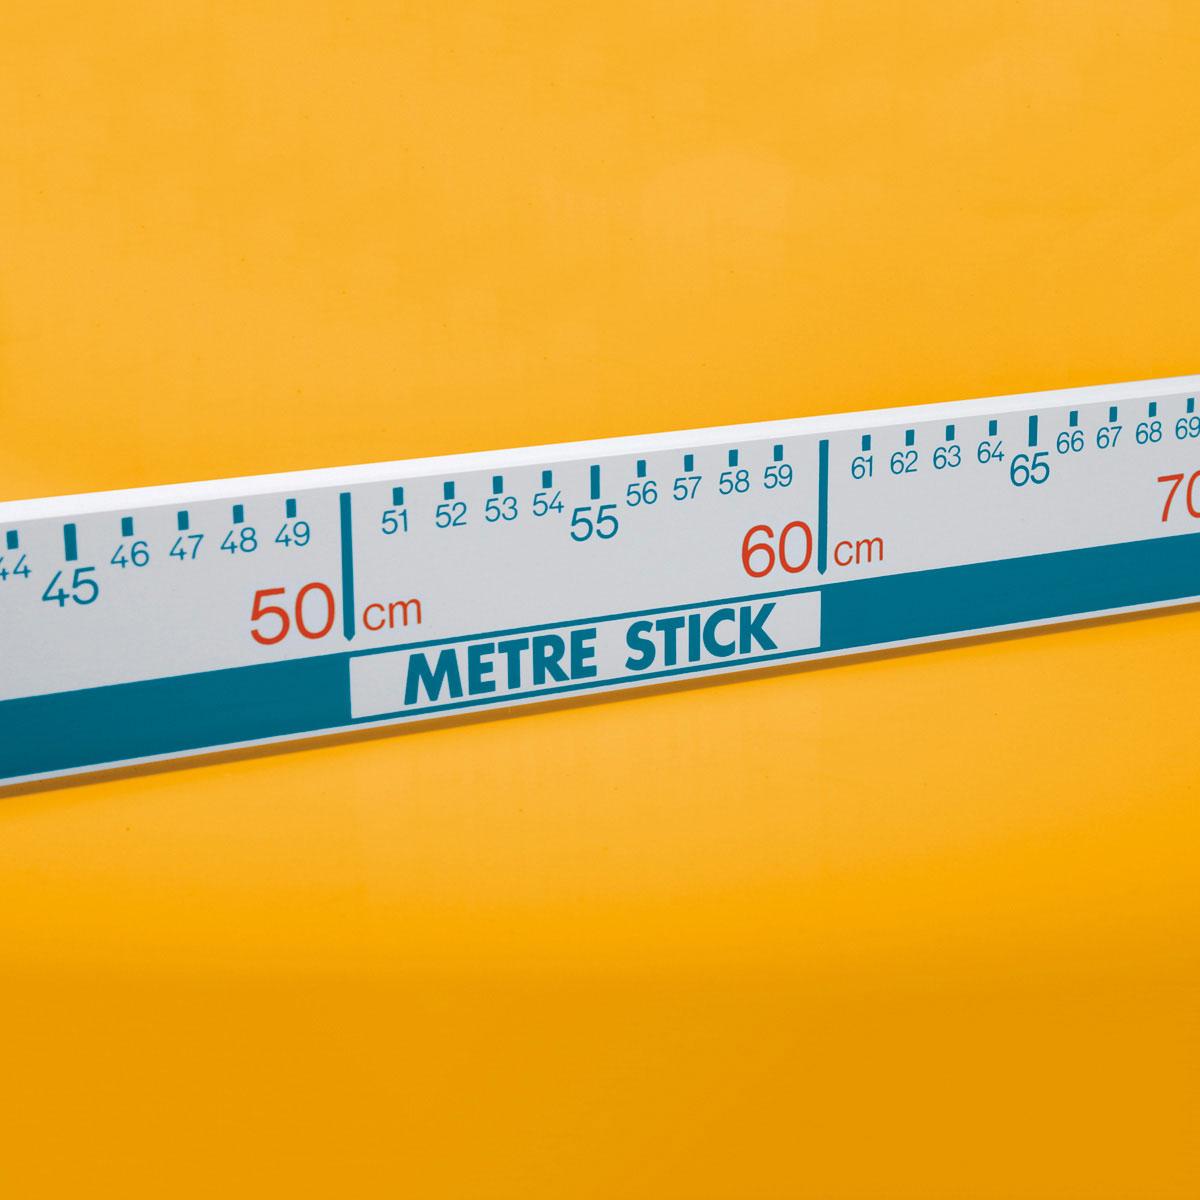 Invicta Metre Stick - Pack of 6